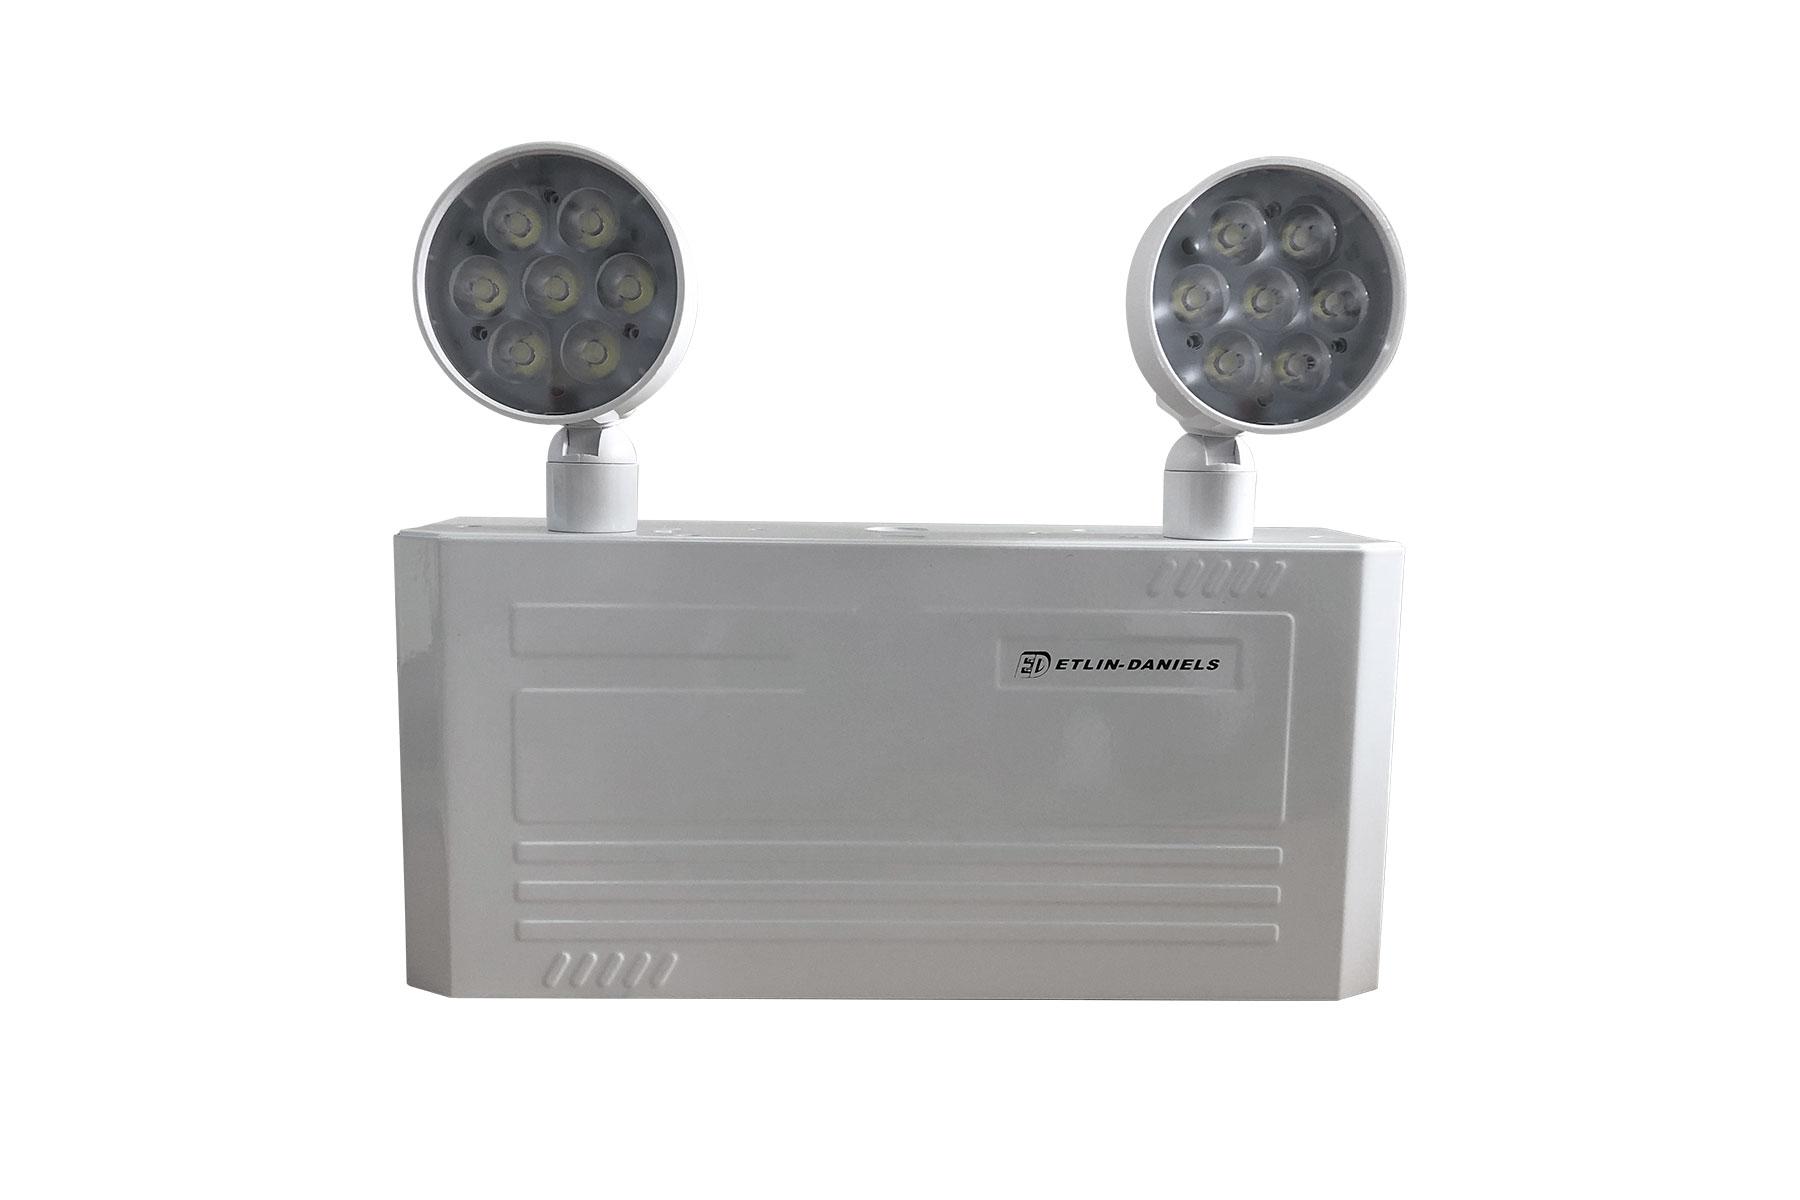 ER302D-WHM-A13-BB-10RC - LED EMERGENCY LIGHT BATTERY UNIT